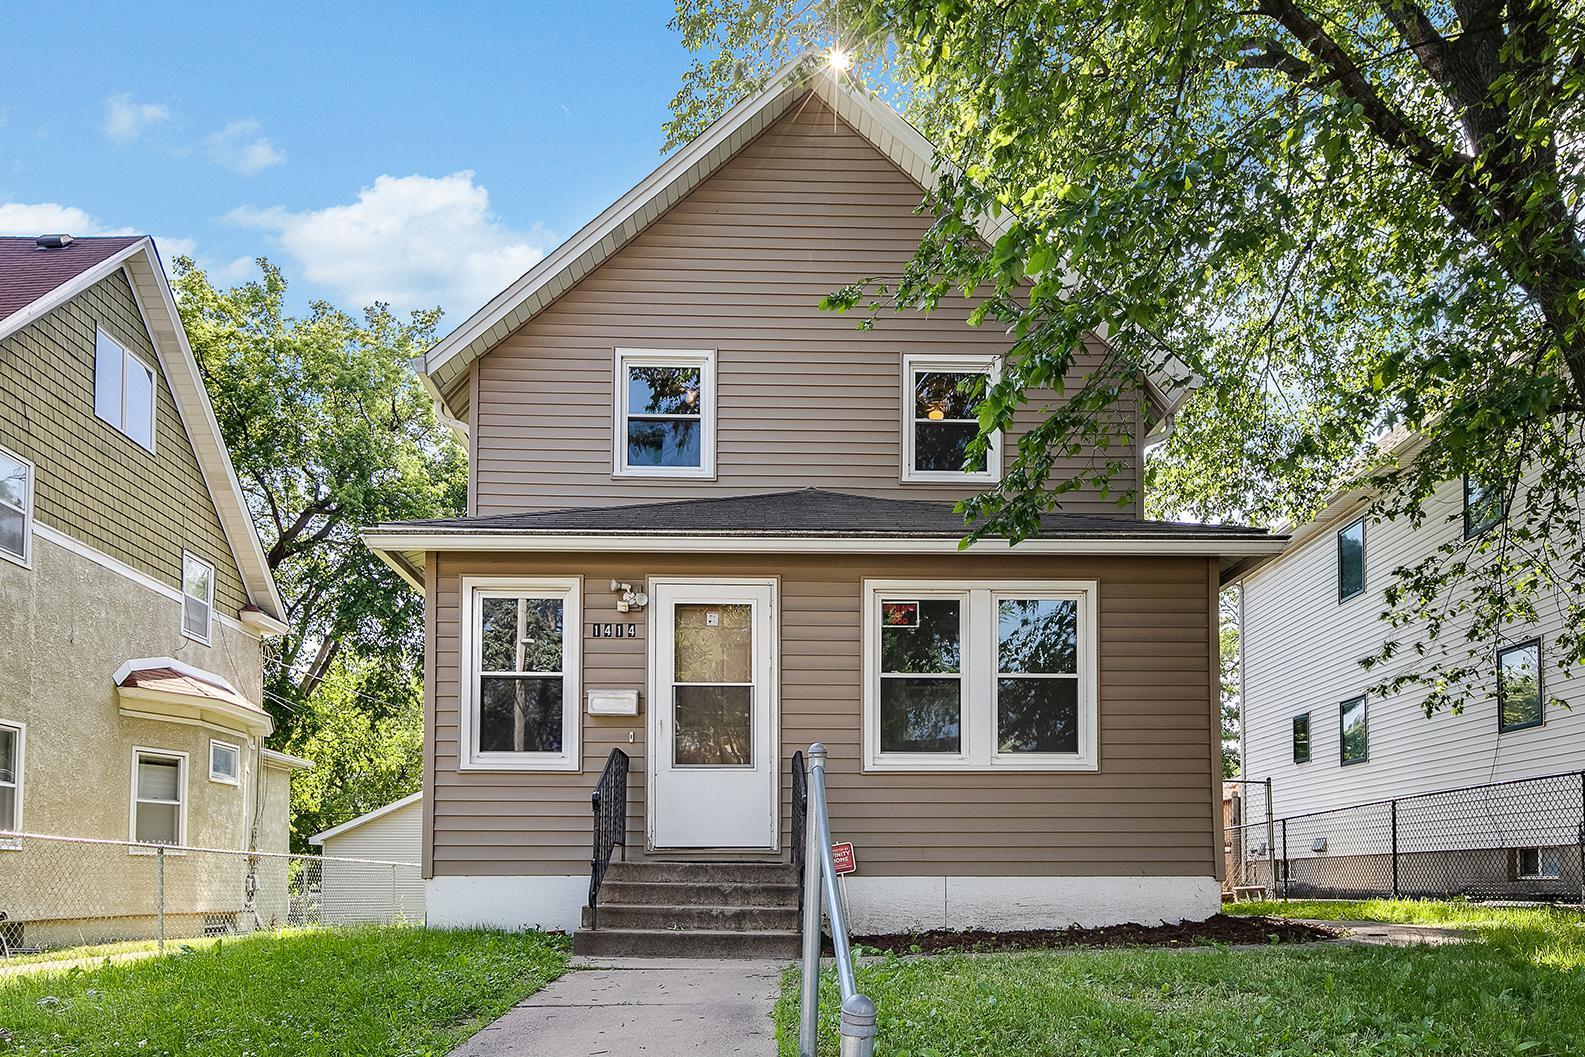 1414 Penn N Property Photo - Minneapolis, MN real estate listing